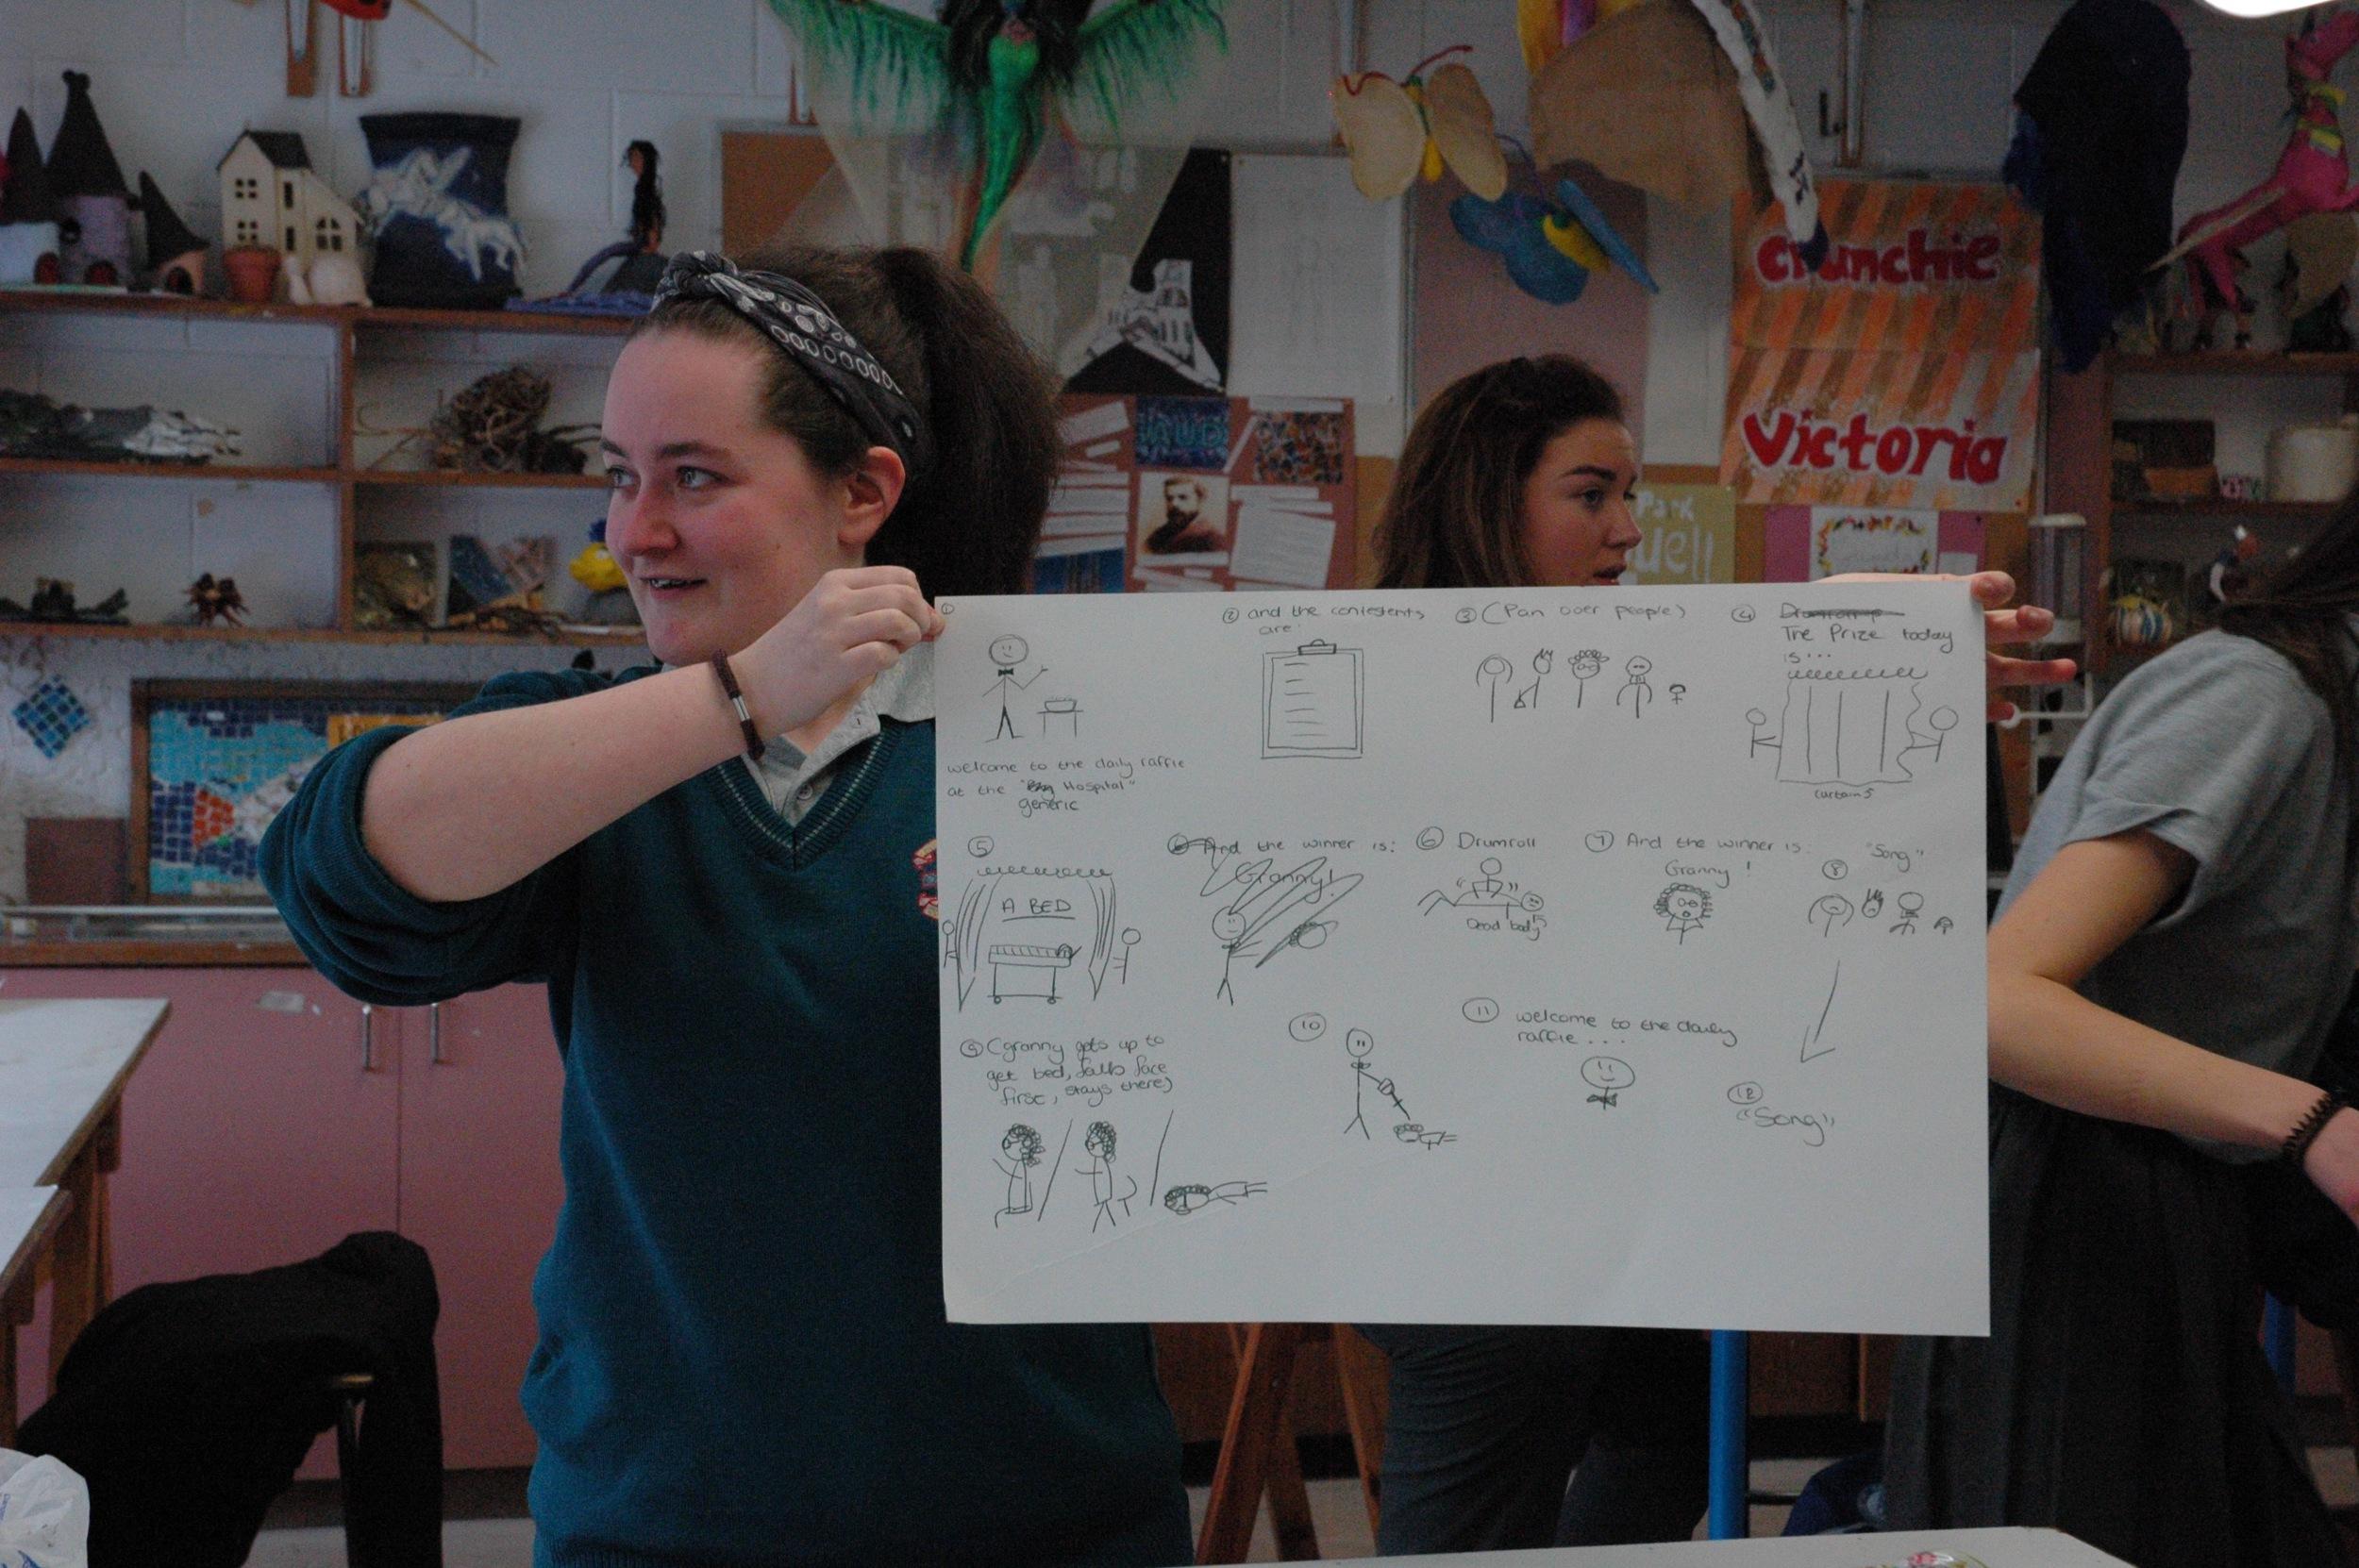 Clodagh Emoe workshop 2 storyboard finished.jpg